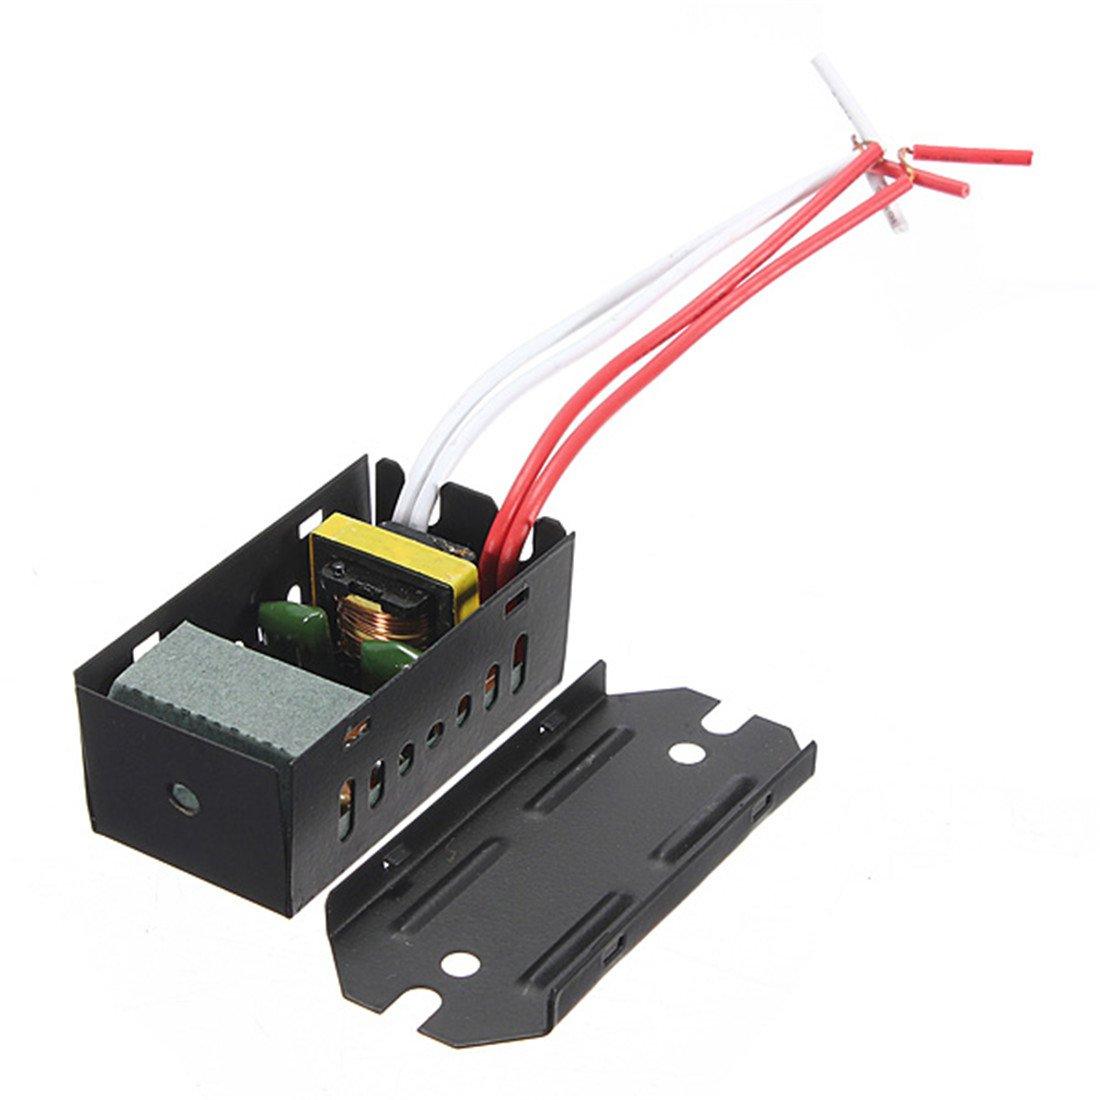 AC 12V 20-50W Power Supply Driver Electronic Transformer for Led Strip Light db